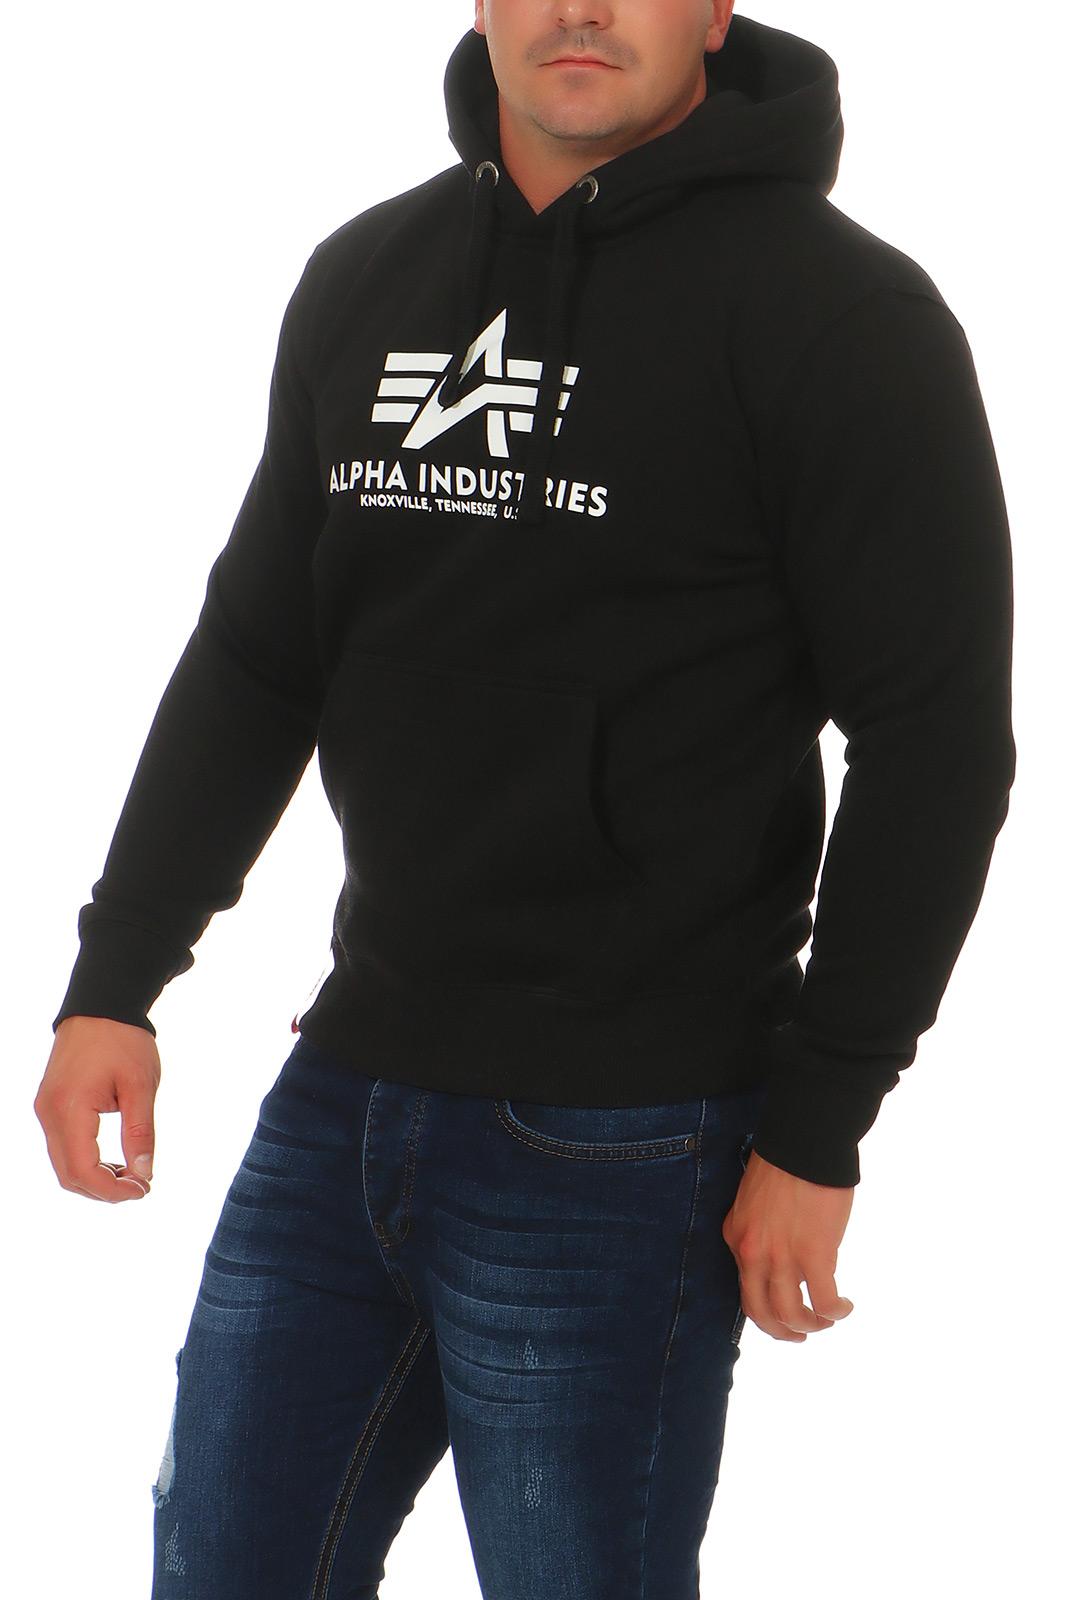 Alpha-Industries-Uomo-Hoody-Pullover-Basic-sweater-NUOVO-178312-hoodie-s-3xl miniatura 8